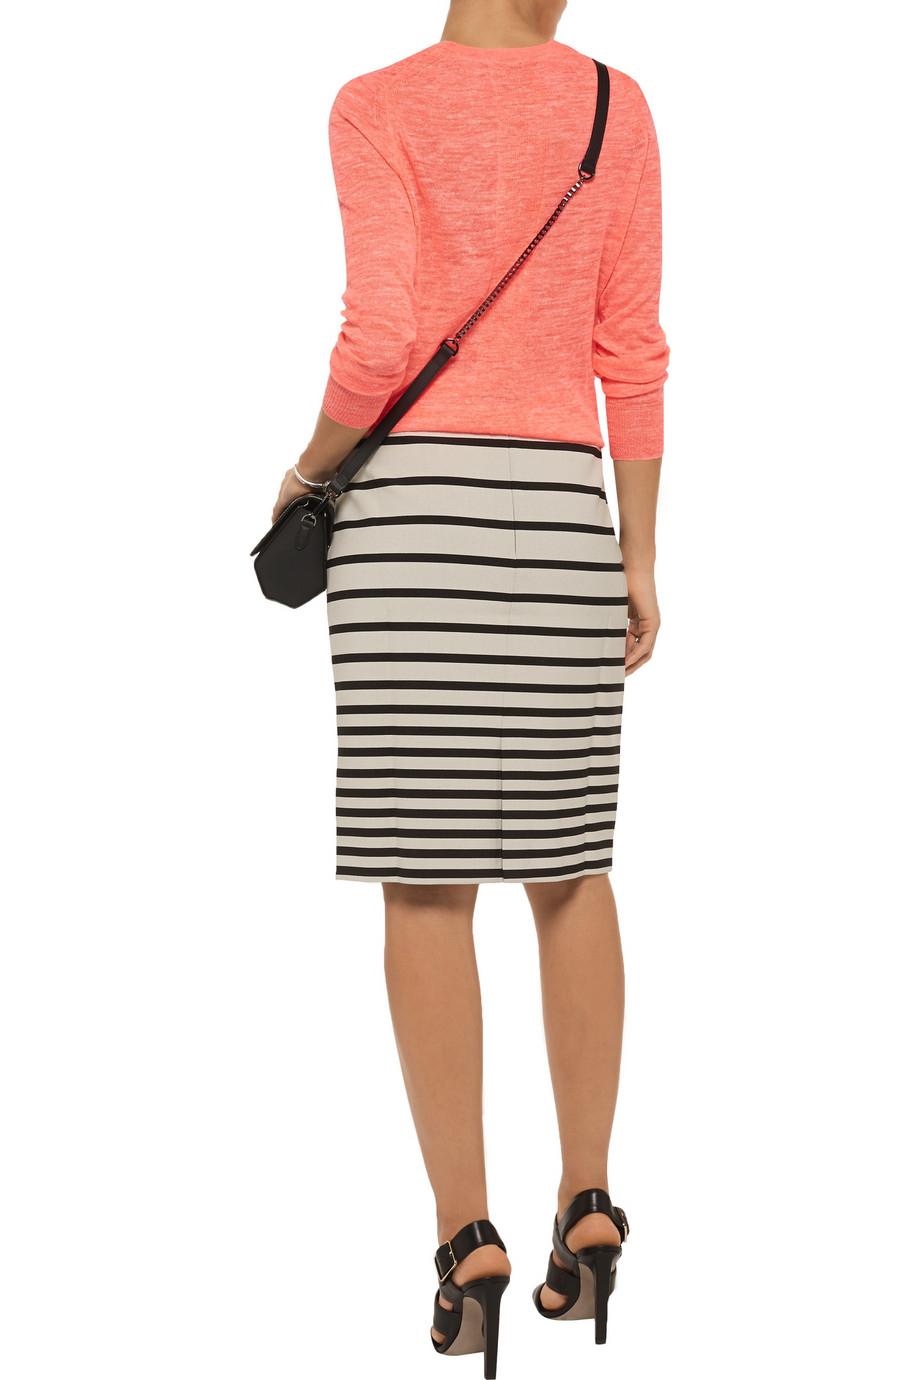 Lyst Halston Heritage Neon Linen Blend Sweater In Pink